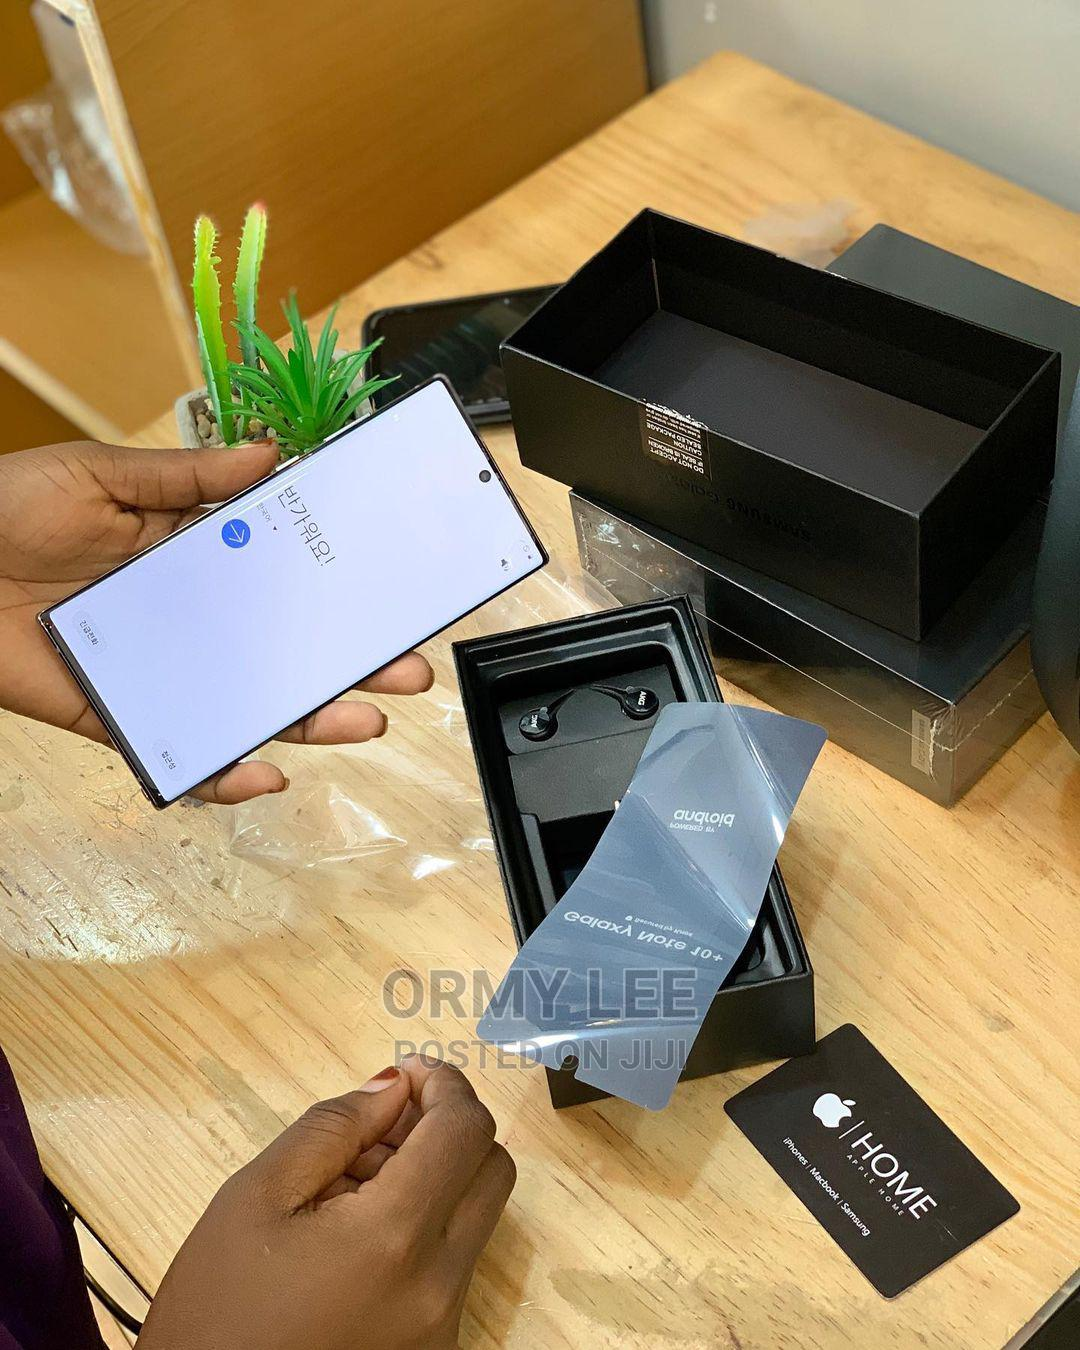 Samsung Galaxy Note 10 Plus 5G 256 GB Silver | Mobile Phones for sale in Ilala, Dar es Salaam, Tanzania